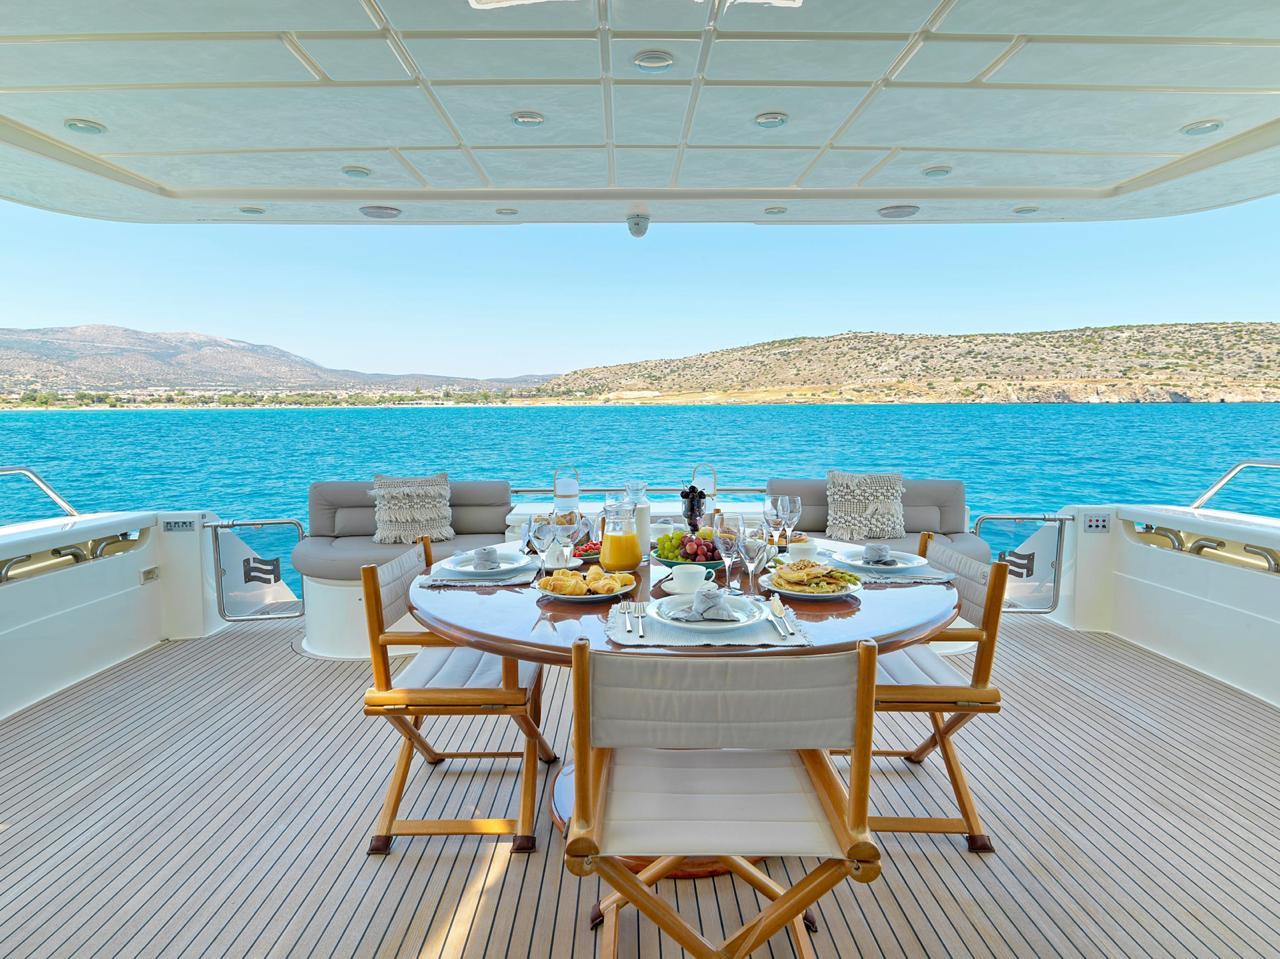 elite-motor-yacht-aft-deck (1)